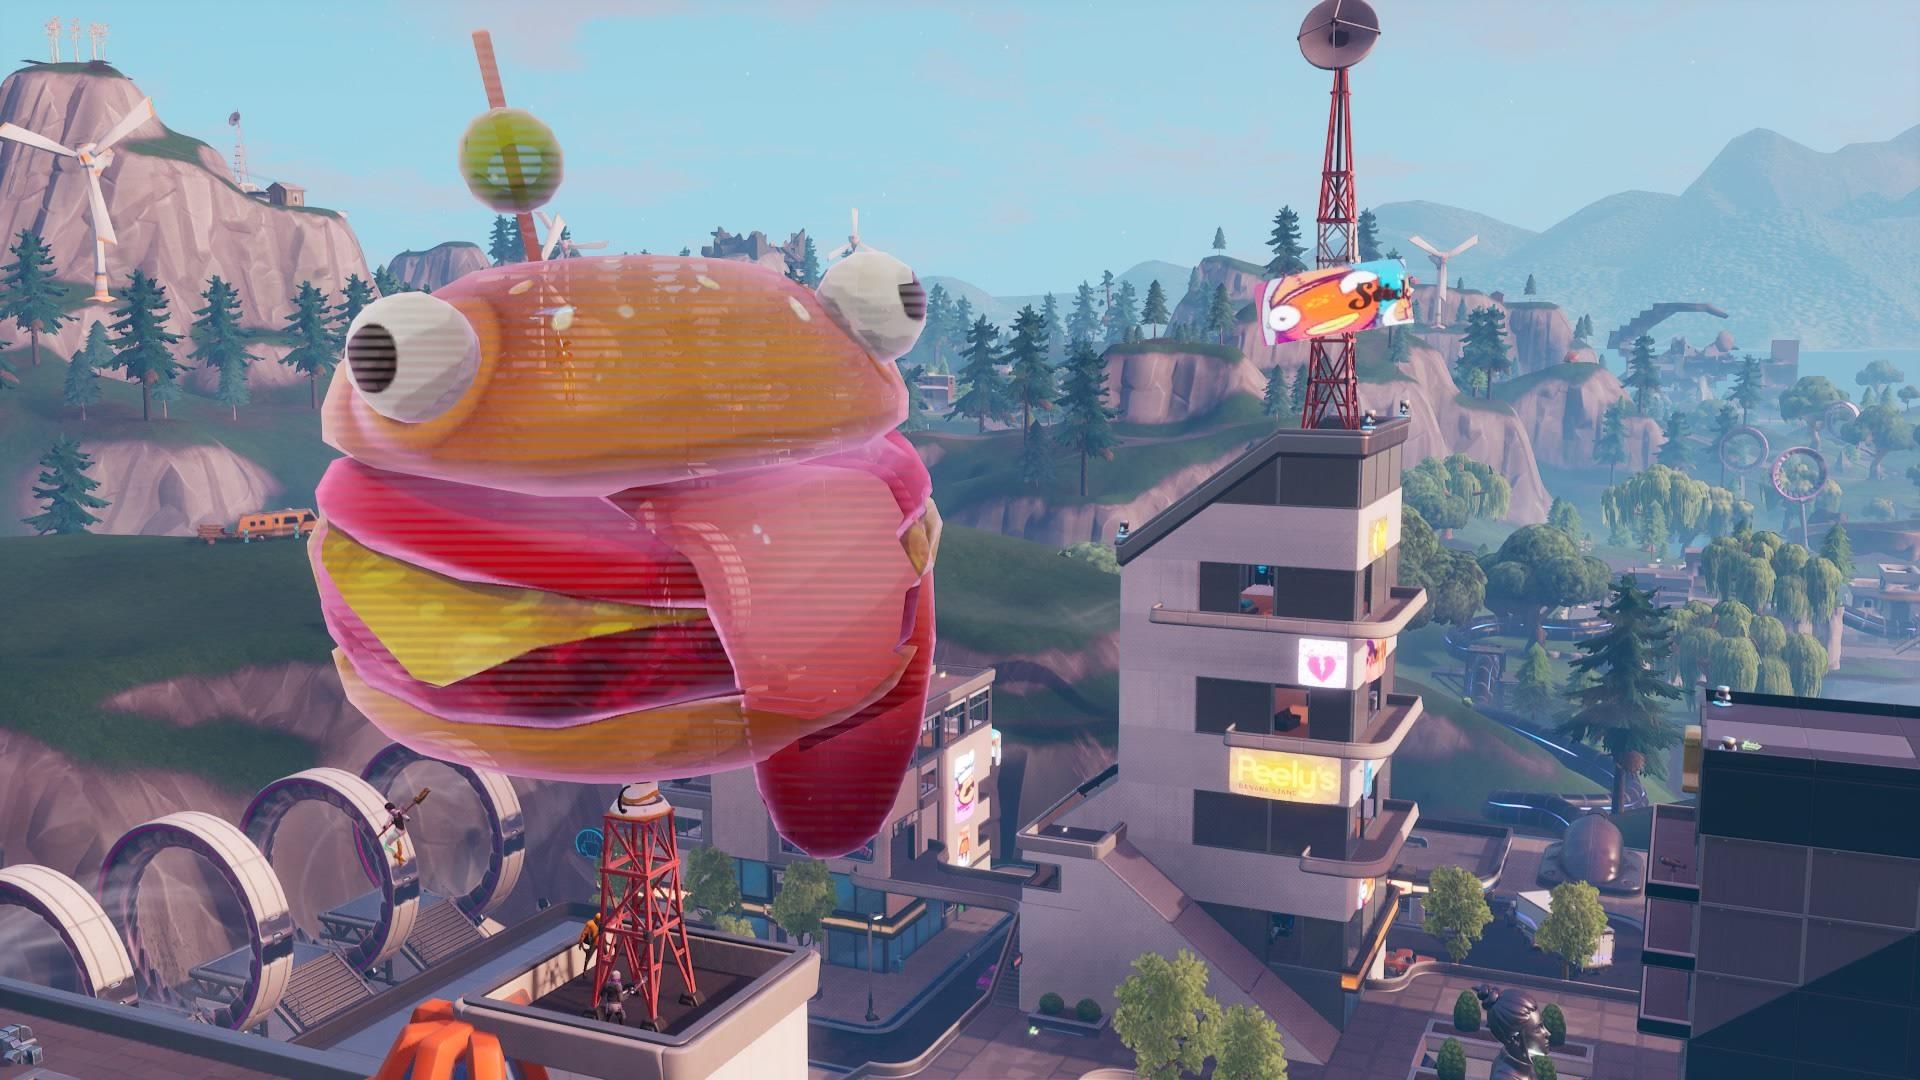 Fortnite Tomato Head Durr Burger And Giant Dumpling